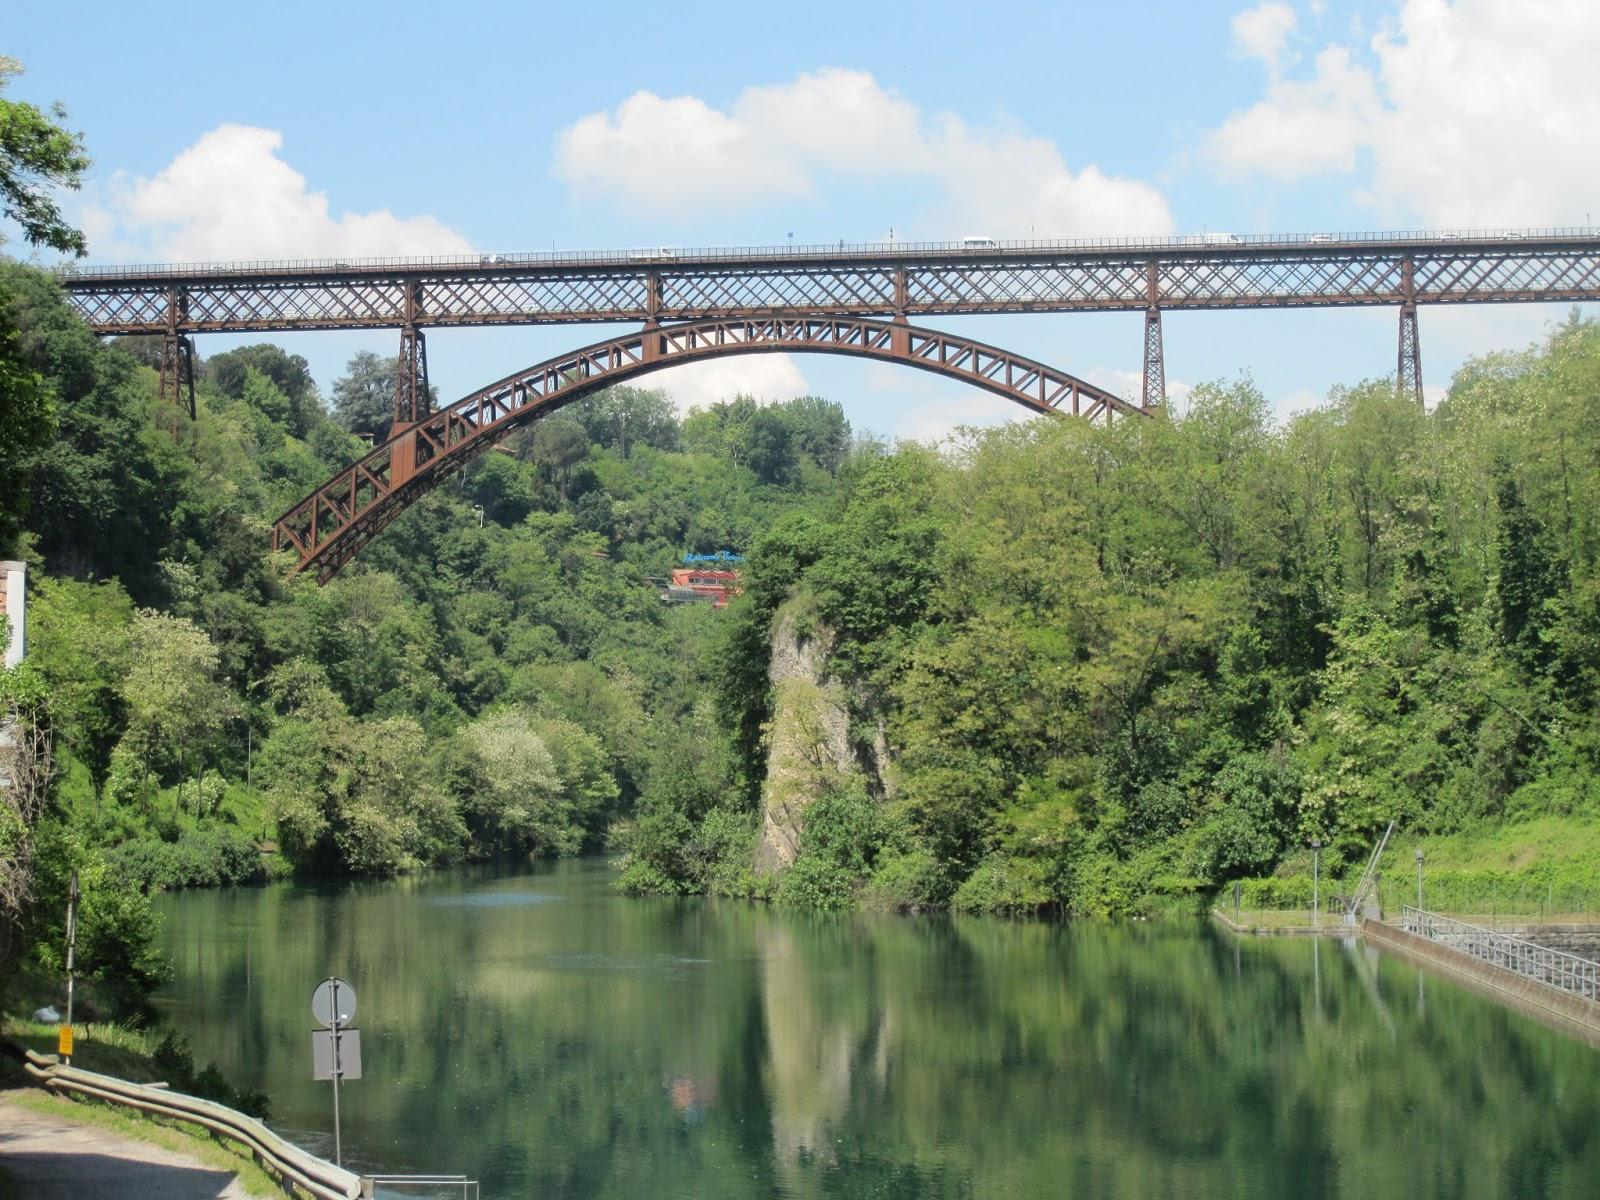 Chiusura Per Ponte.Chiusura Ponte San Michele I Disagi Dei Pendolari Radio